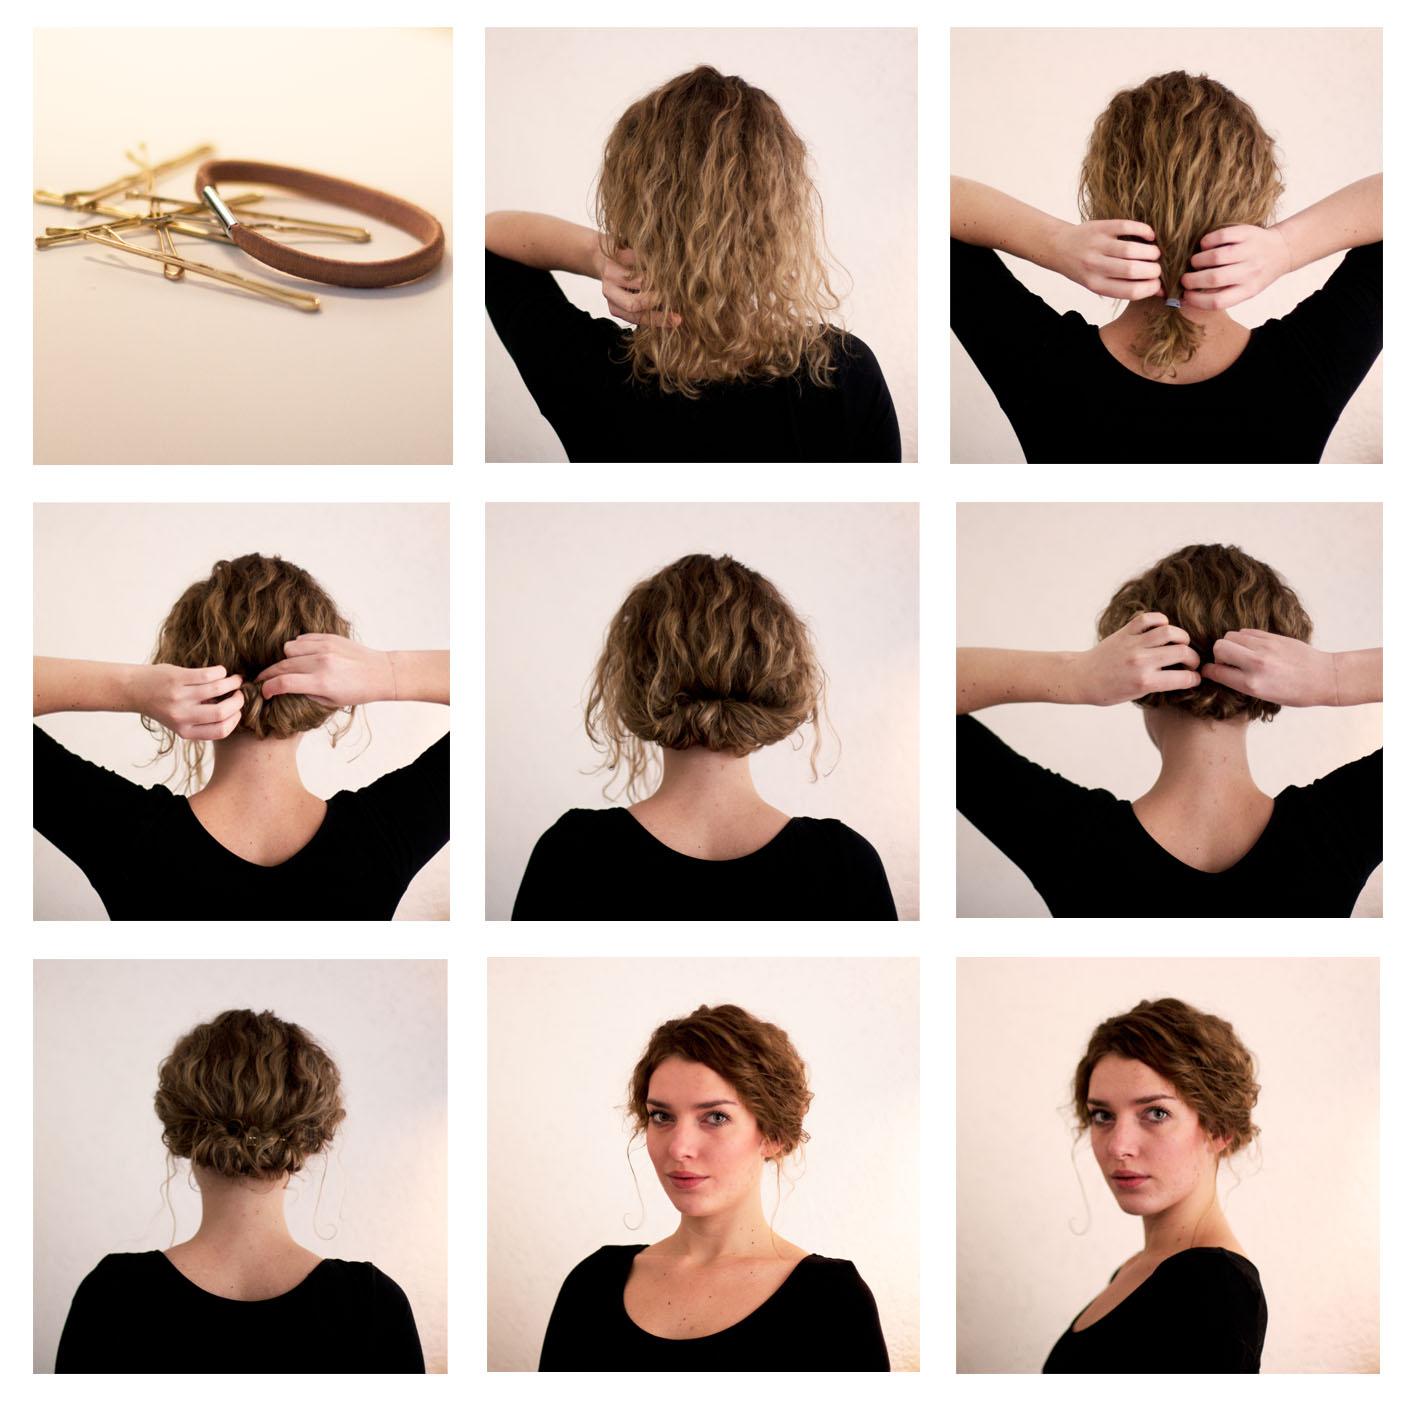 Причёски в школу с короткими волосами по плечи